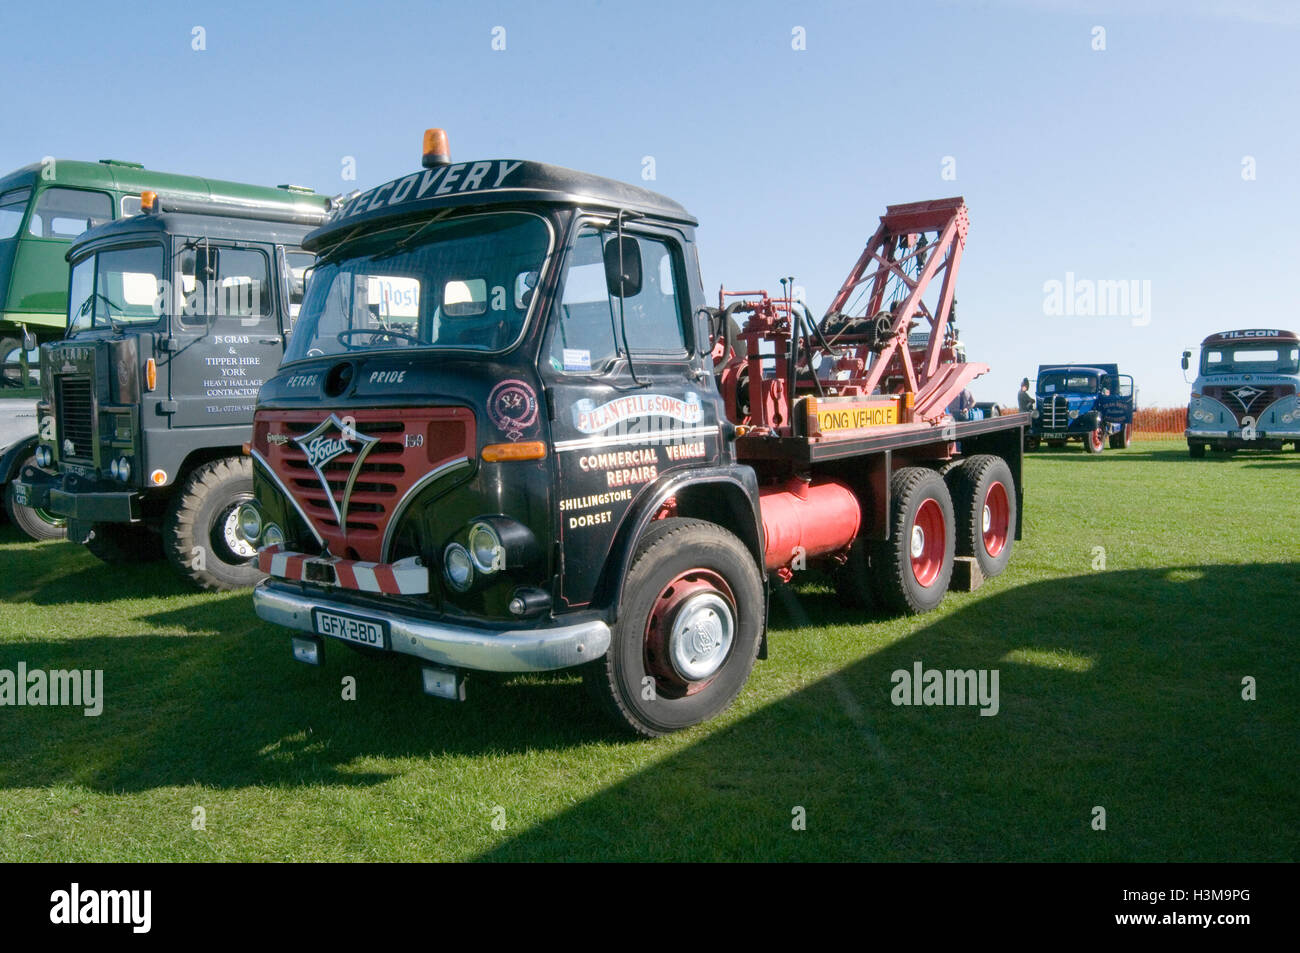 foden truck breakdown trucks lorry lorries english - Stock Image